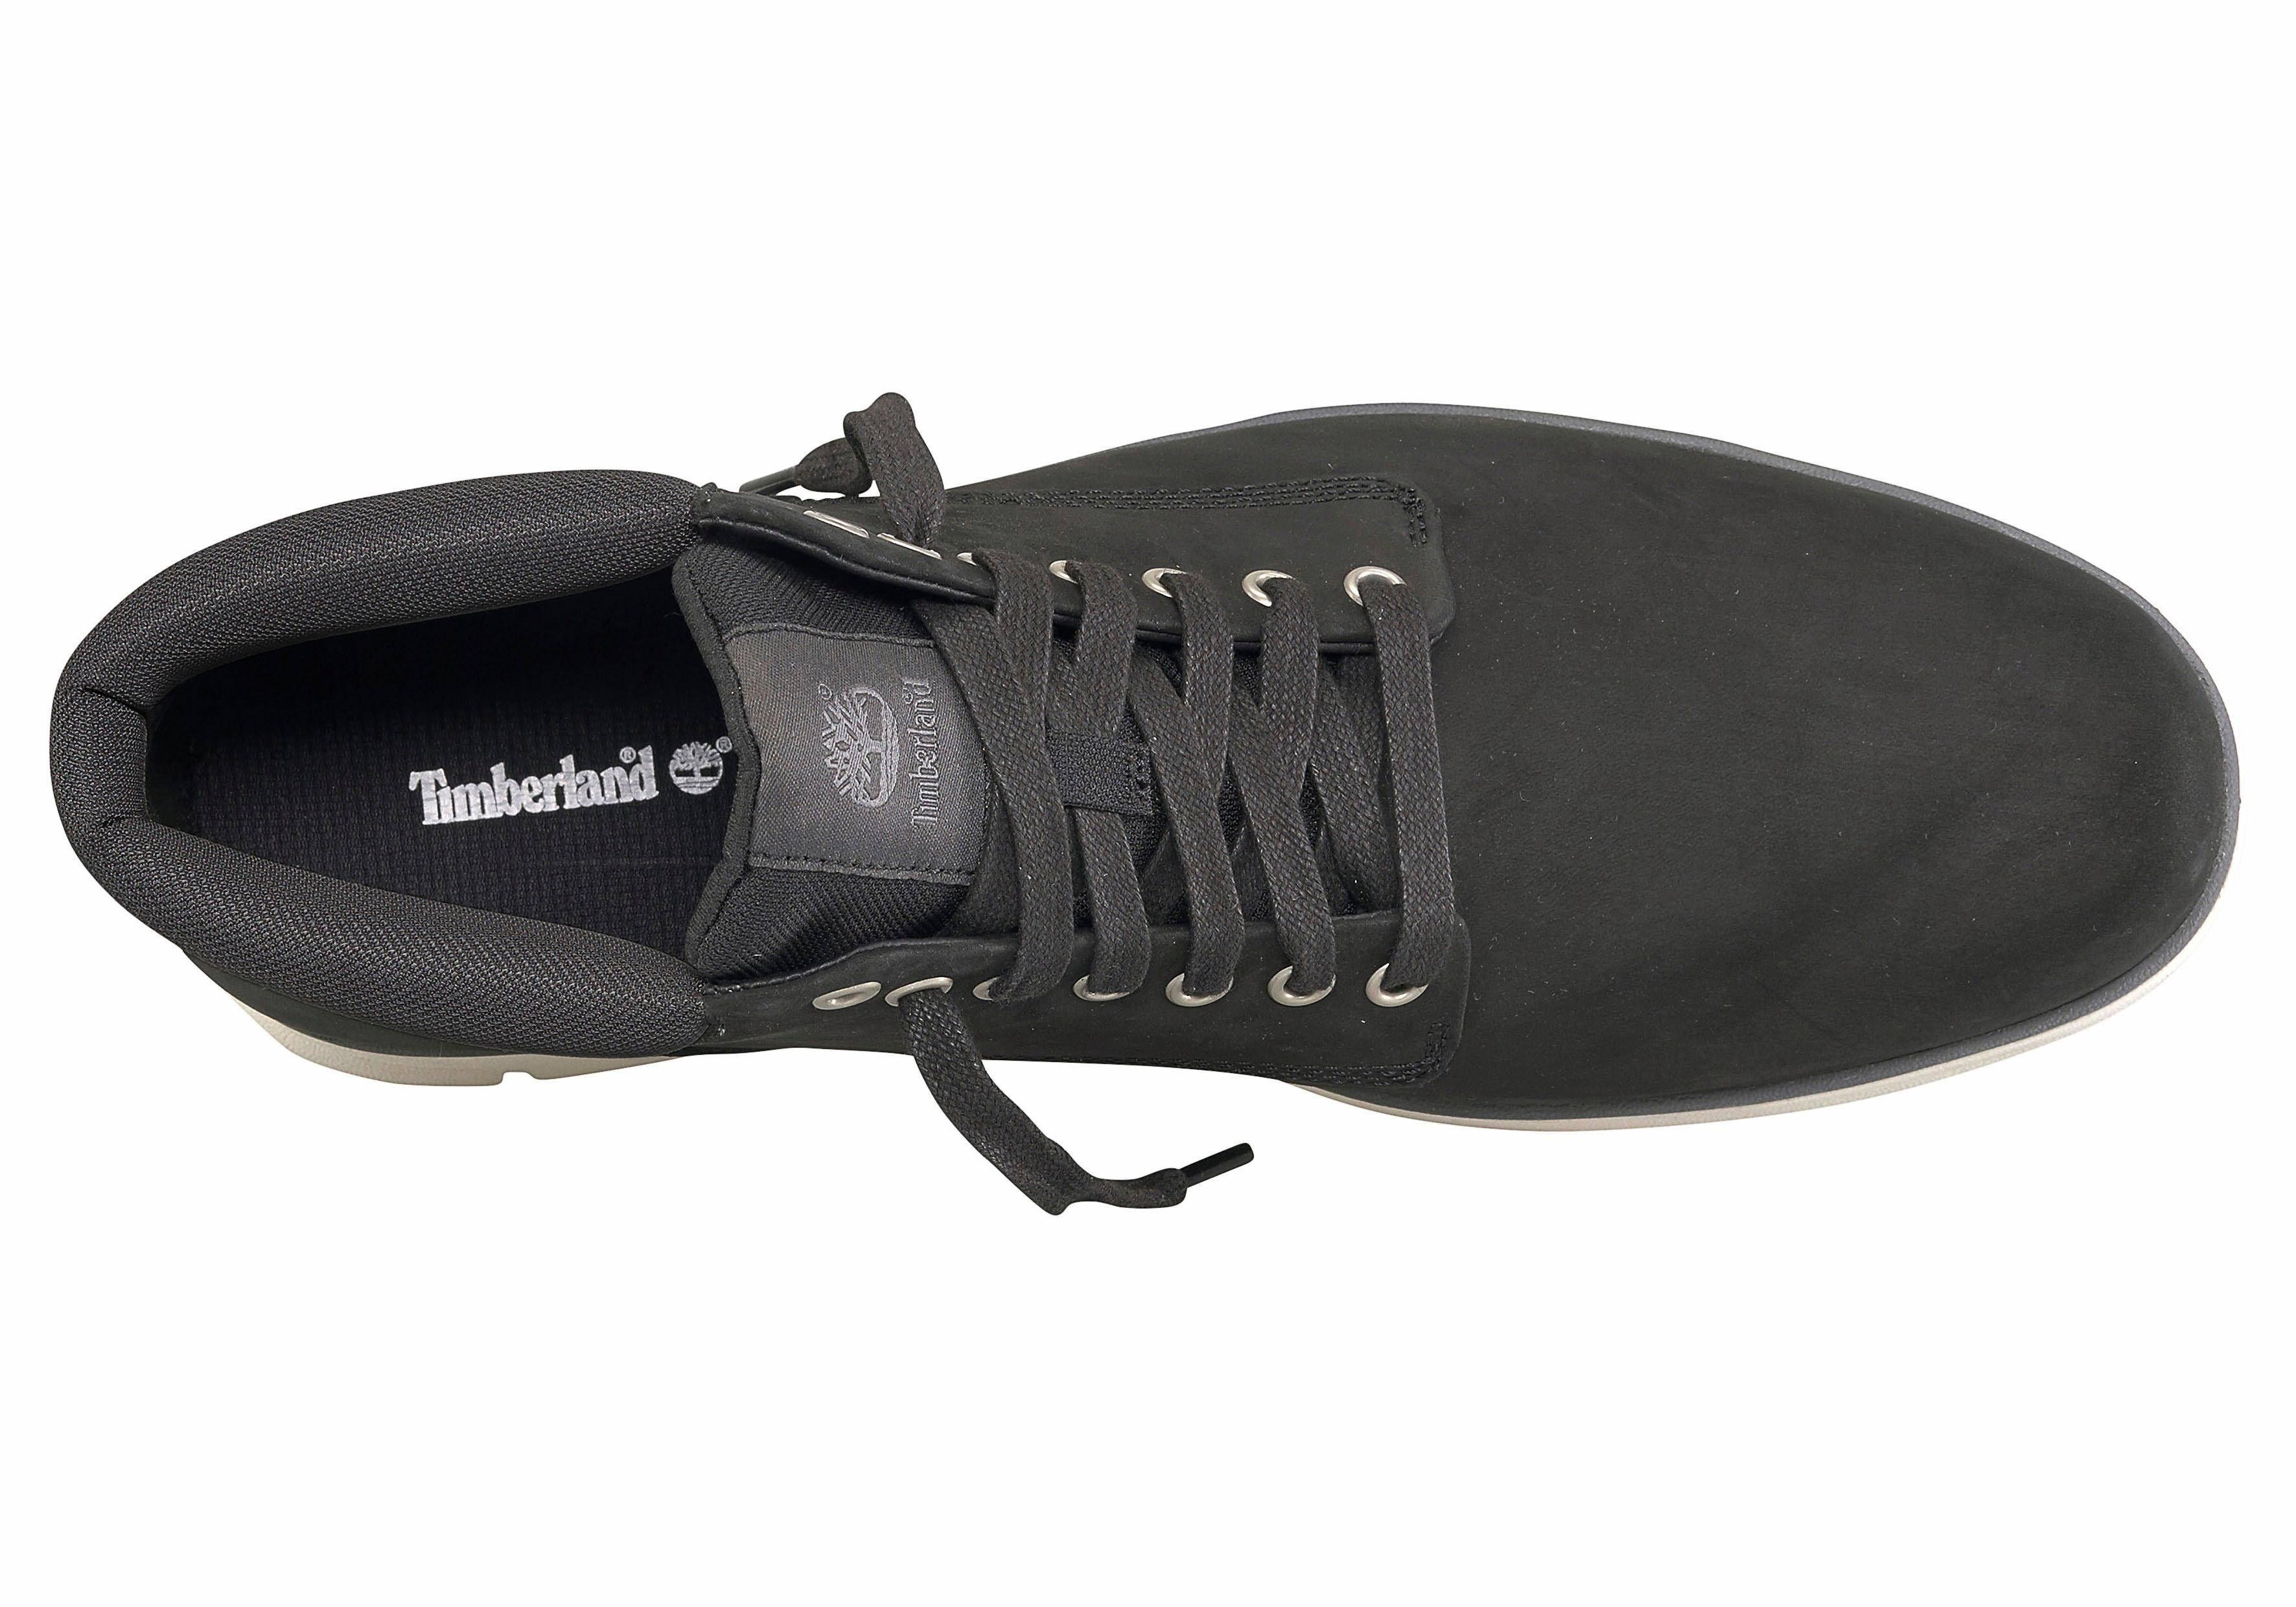 Schwarz Bradstreet 41 Boots Chukka Black Nubuck Timberland qSwn7AZ